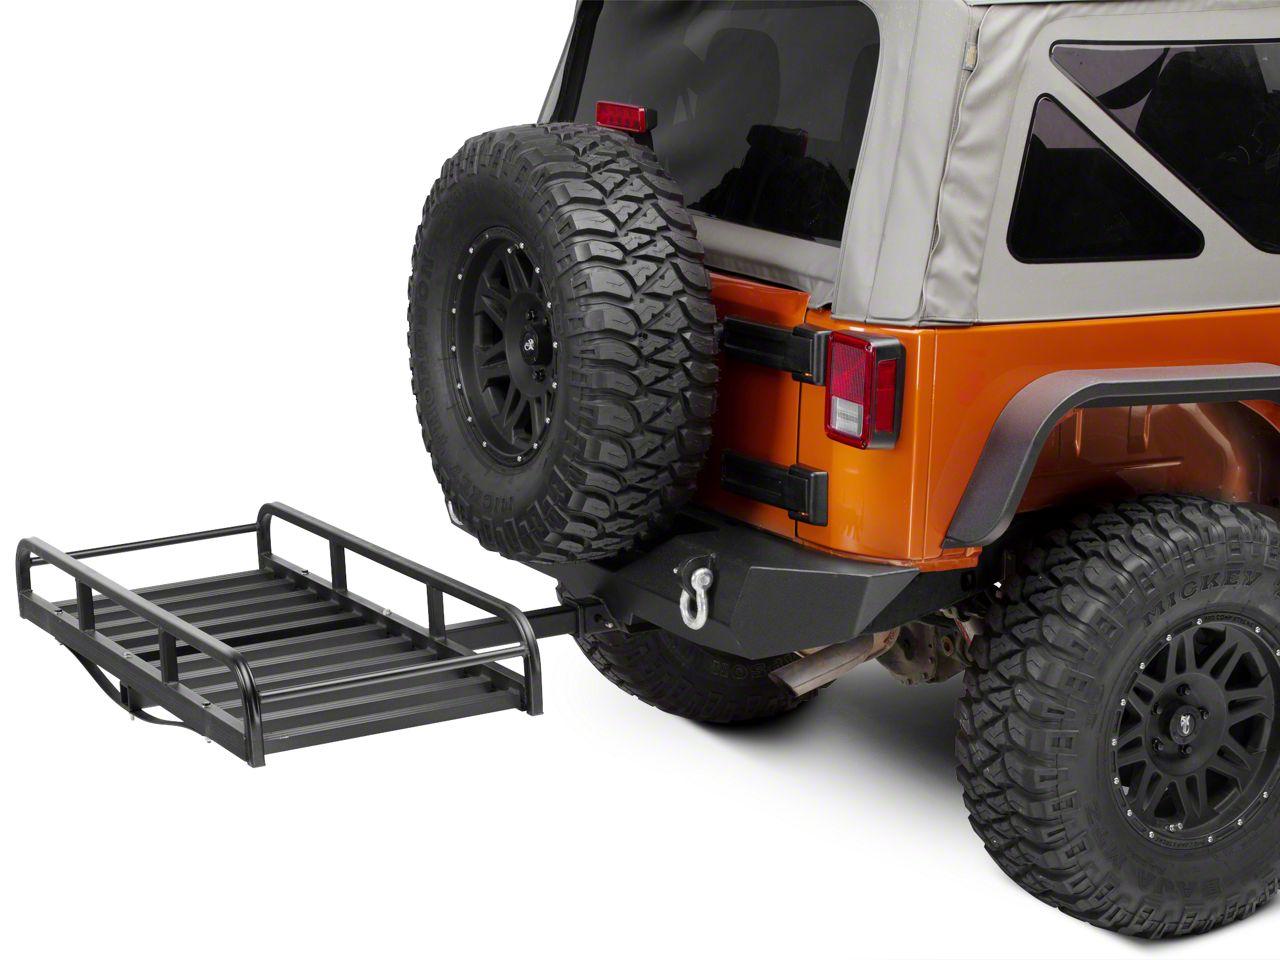 RedRock 4x4 Hitch Mounted Cargo Rack - 7 in. XL (07-19 Jeep Wrangler JK & JL)